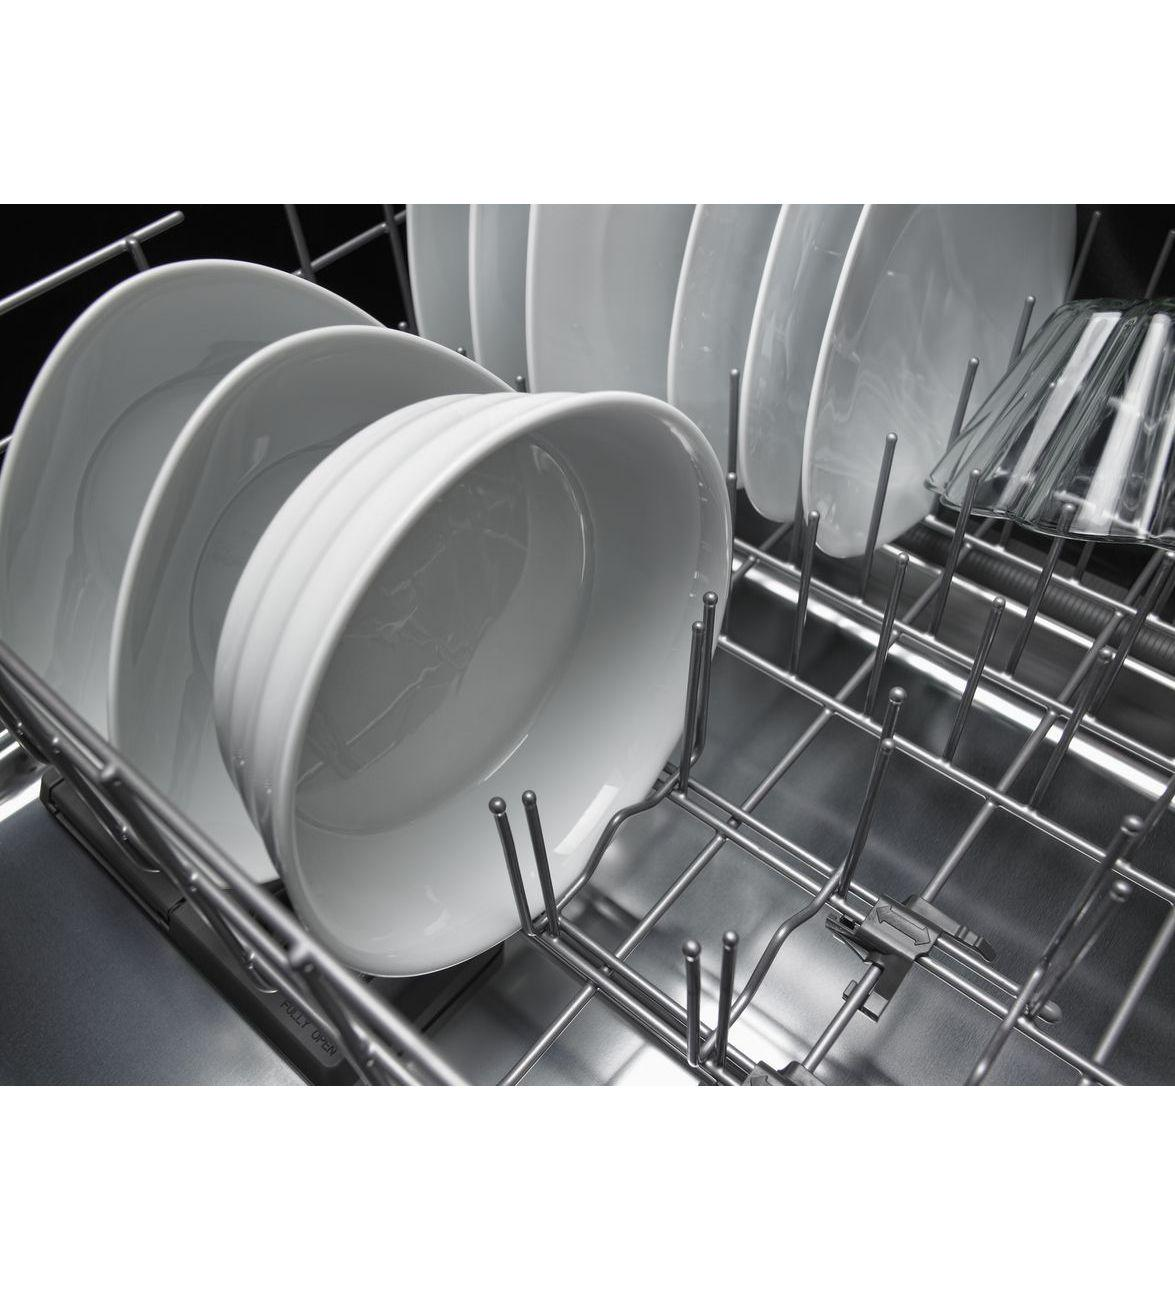 Kdte404dsp kitchenaid kdte404dsp architect series ii - Kitchenaid dishwasher not cleaning top rack ...